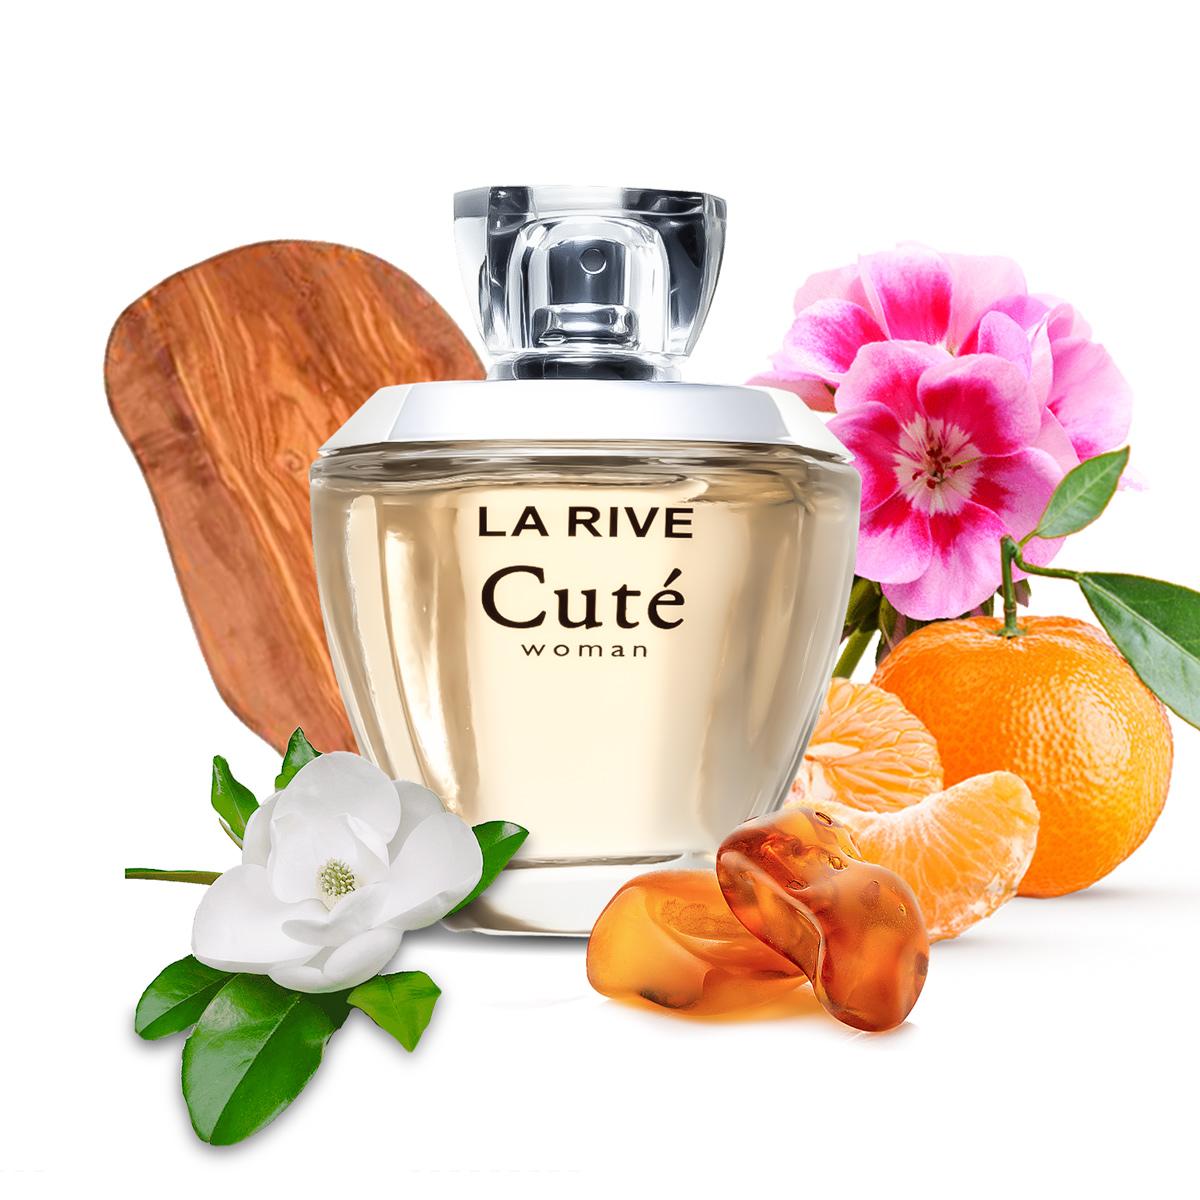 Kit 2 Perfumes Importados Extreme e Cuté La Rive  - Mercari Perfumes